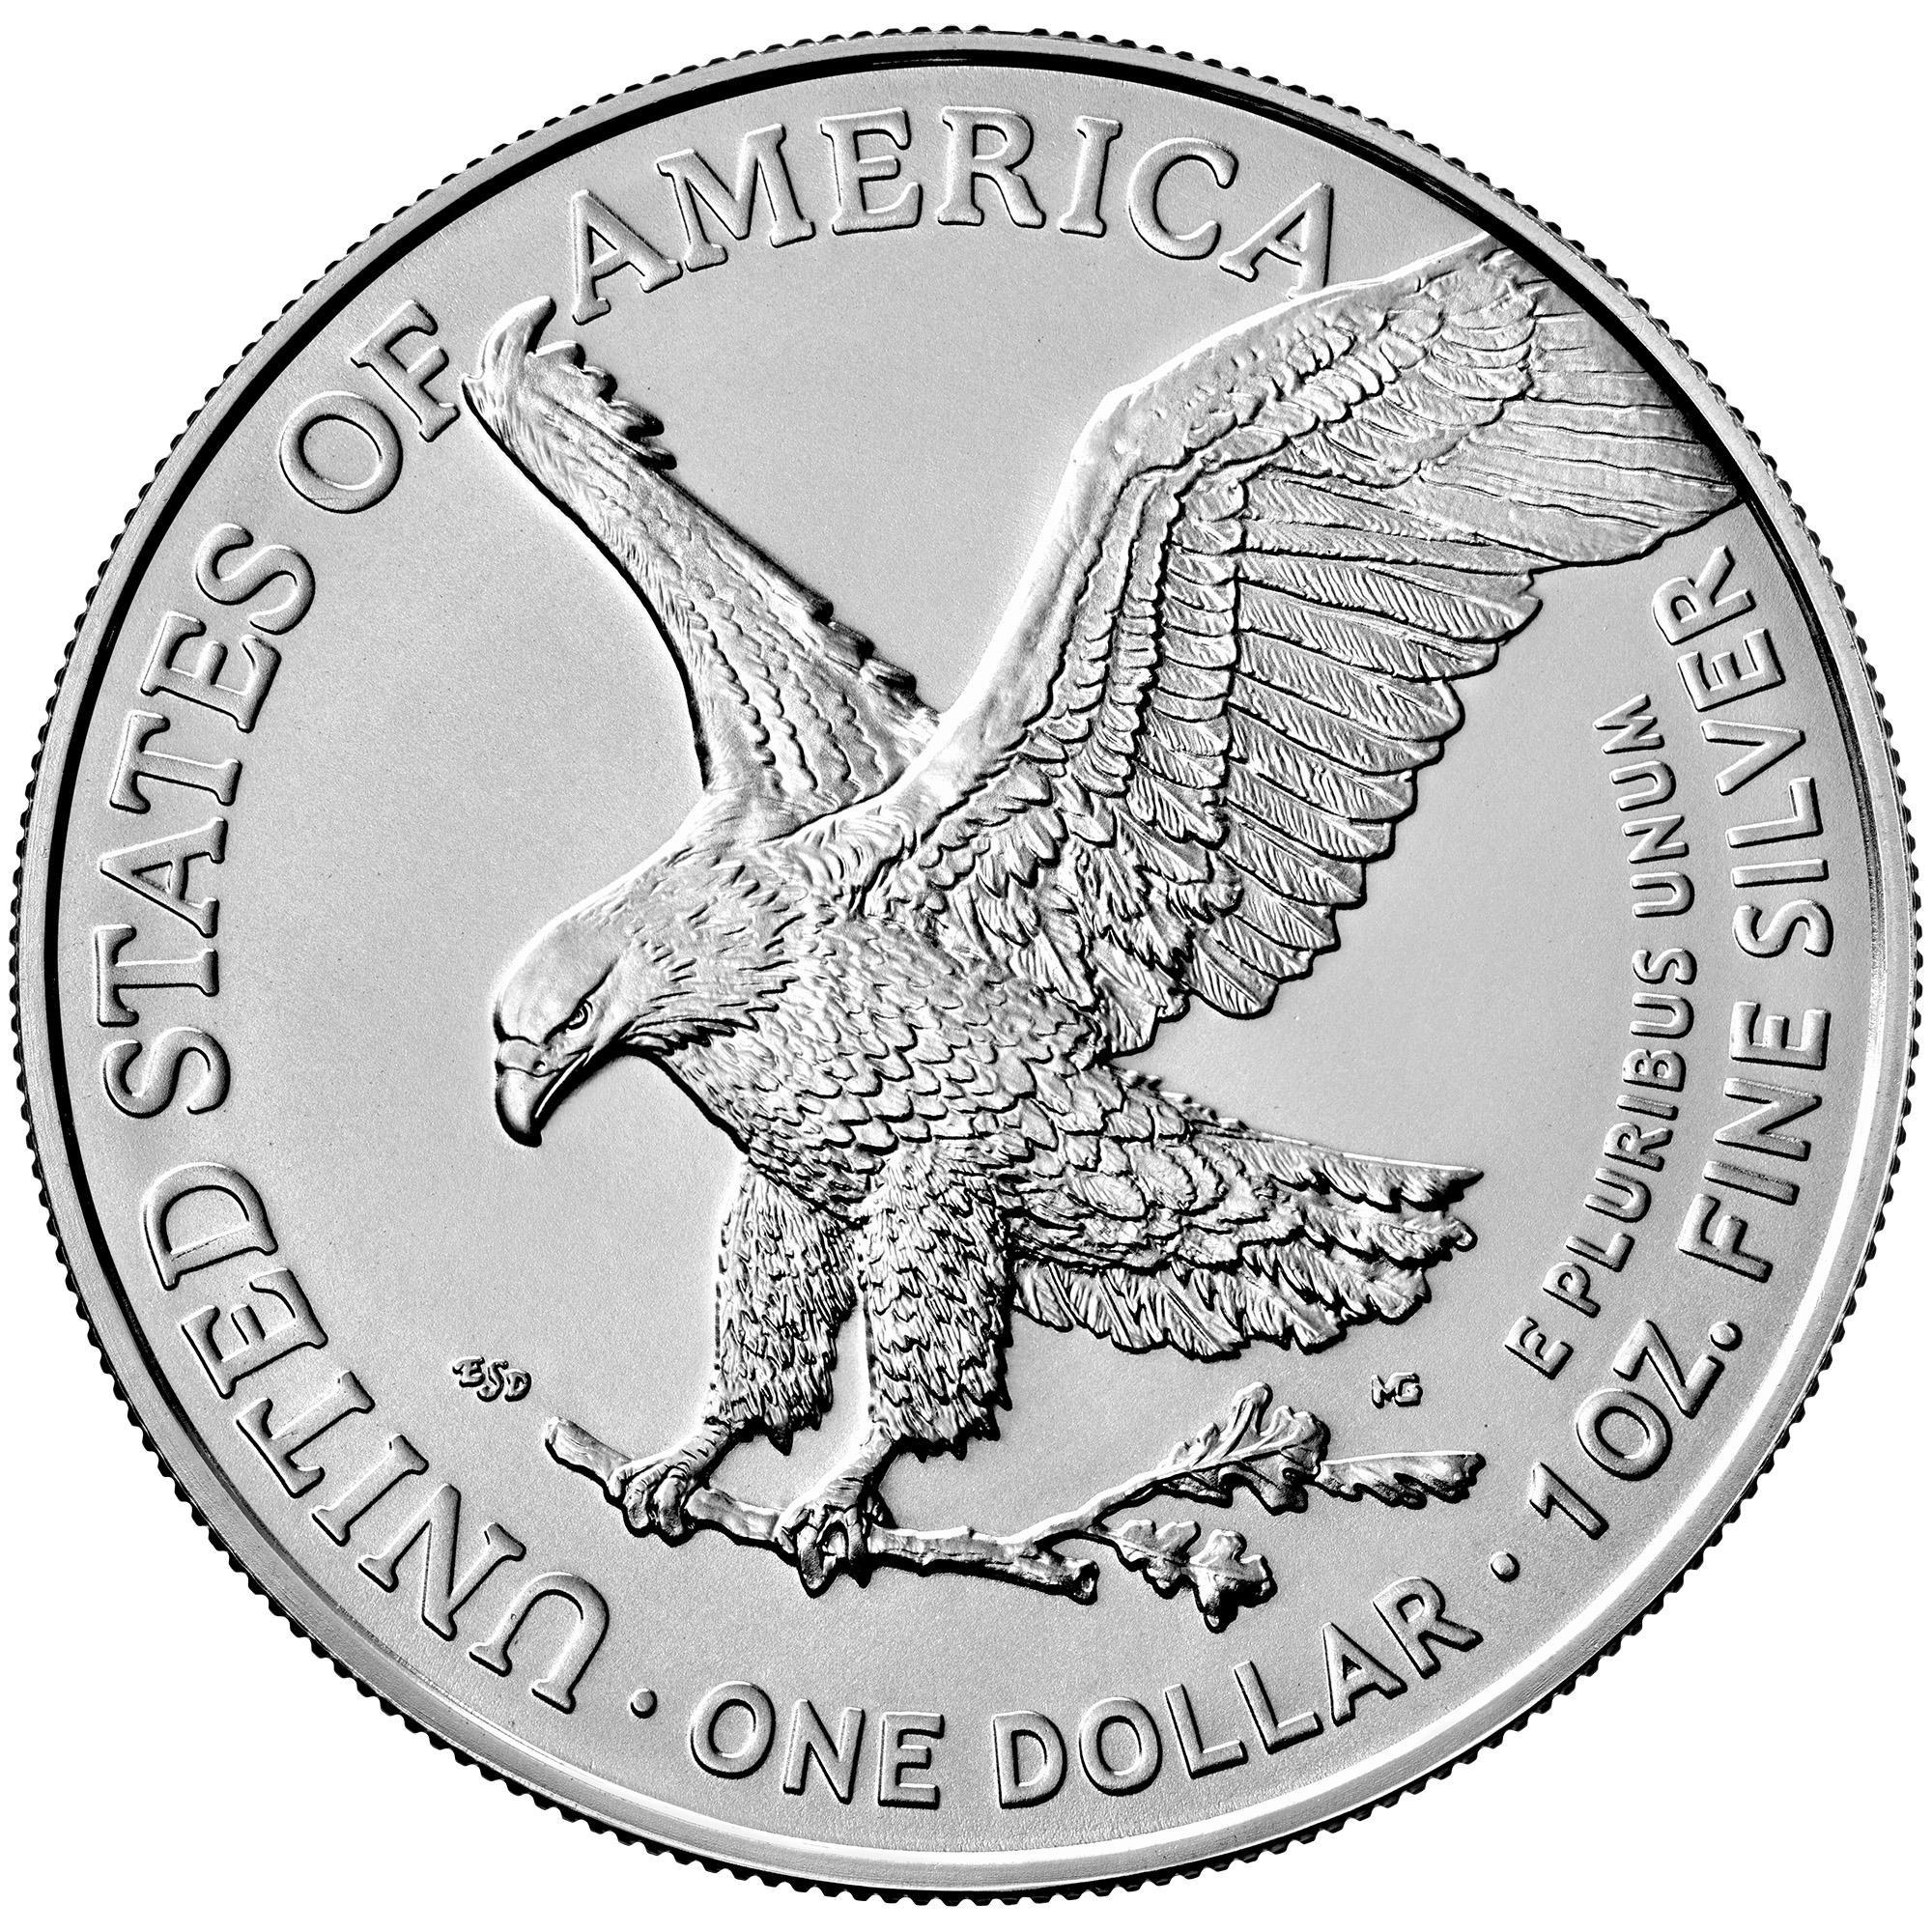 1 Unze (oz) American Eagle Silbermünze Neuware - neues Motiv